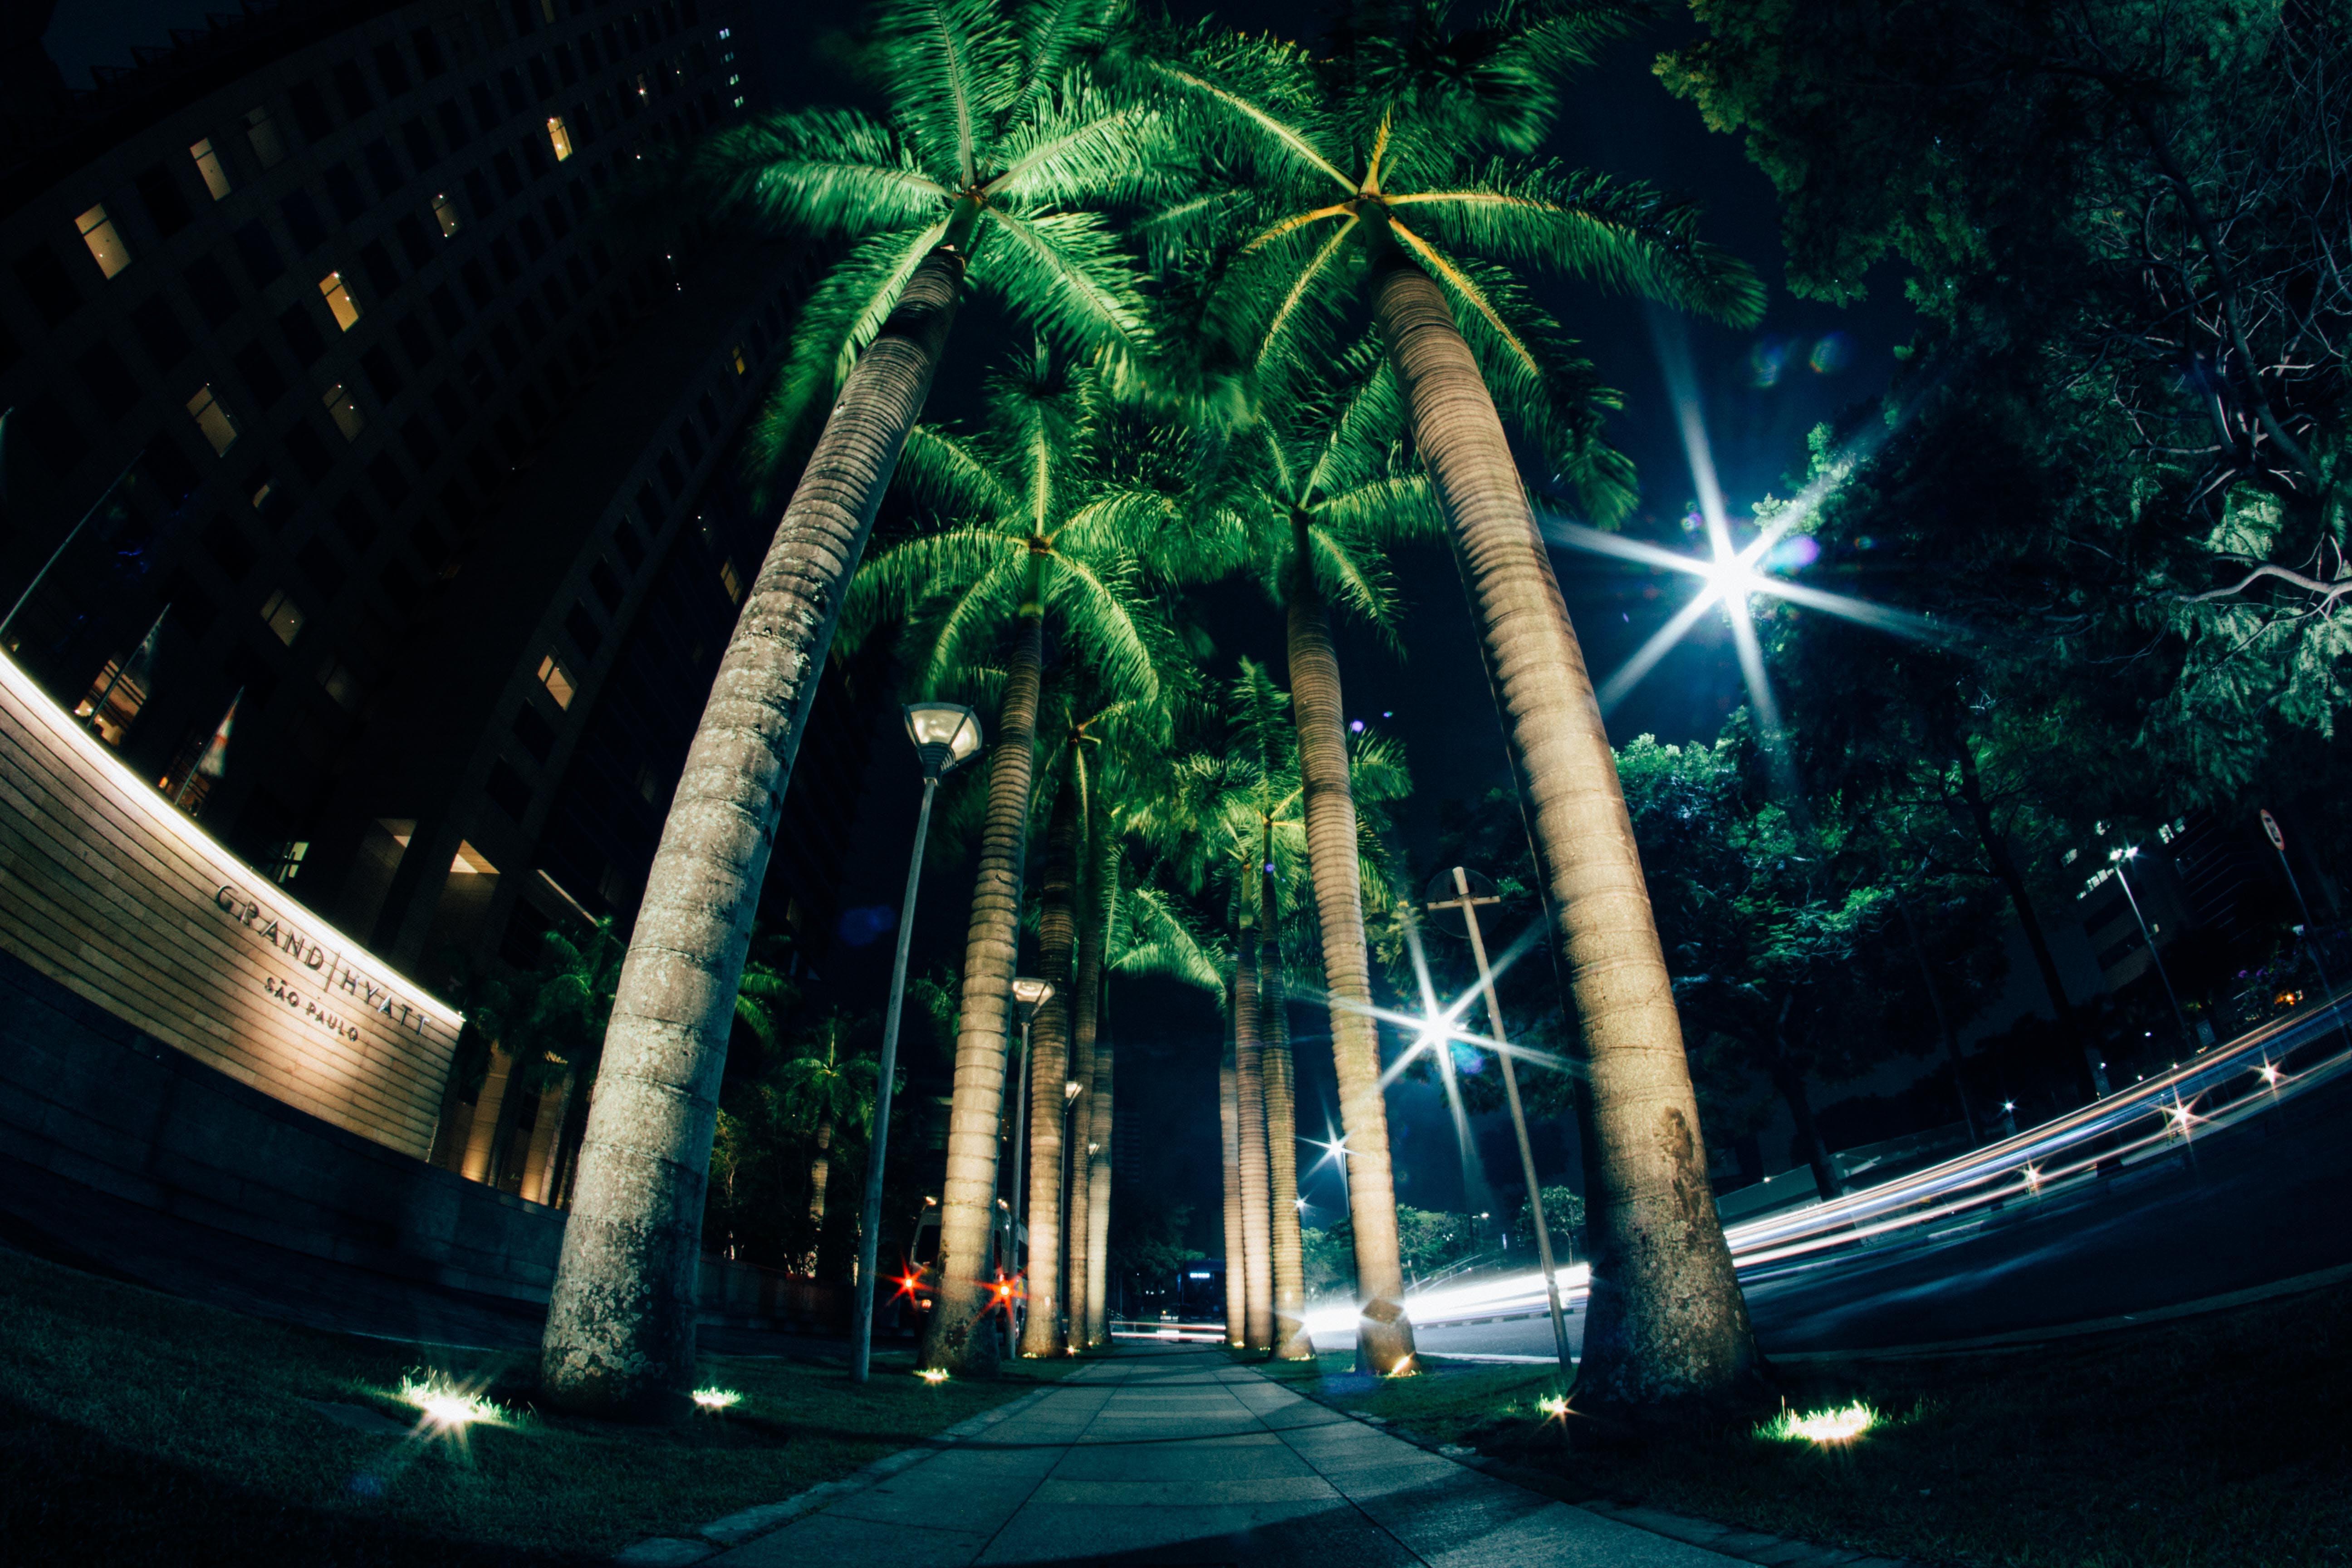 lights, night, palm trees